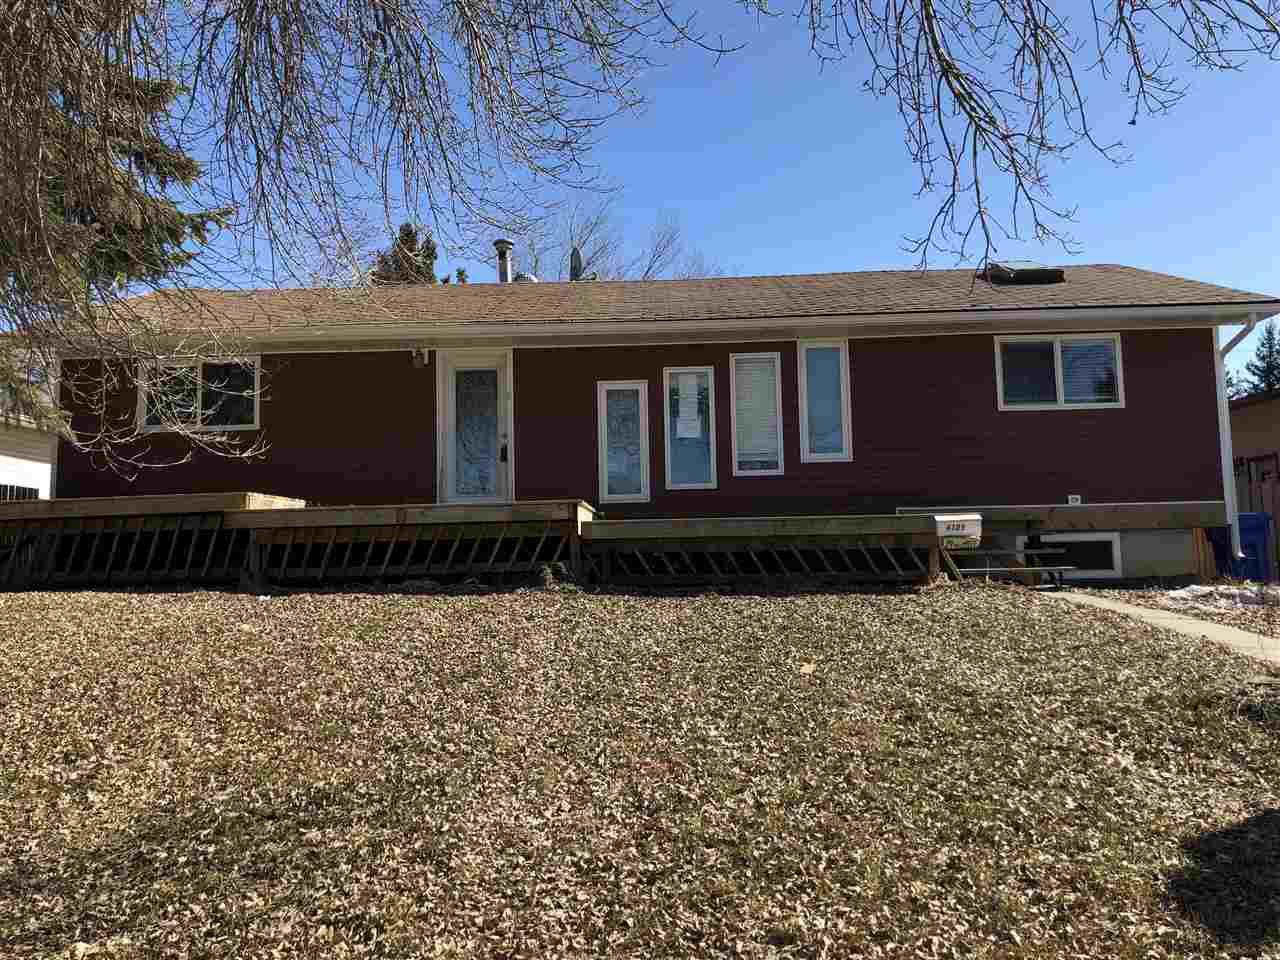 Main Photo: 4109 55 Street: Wetaskiwin House for sale : MLS®# E4148894